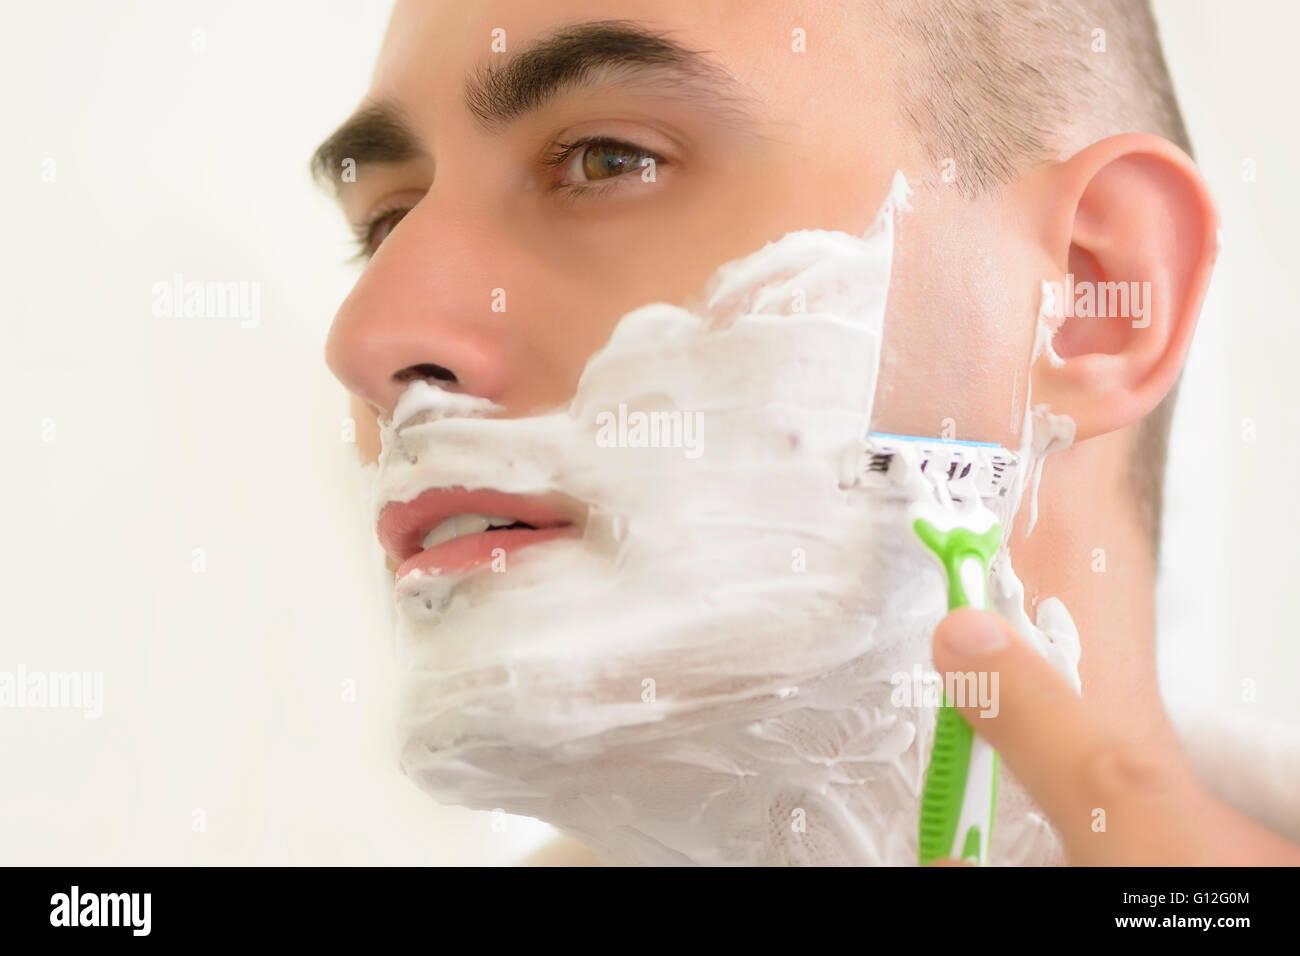 Young man shaving using shaving blade - Stock Image